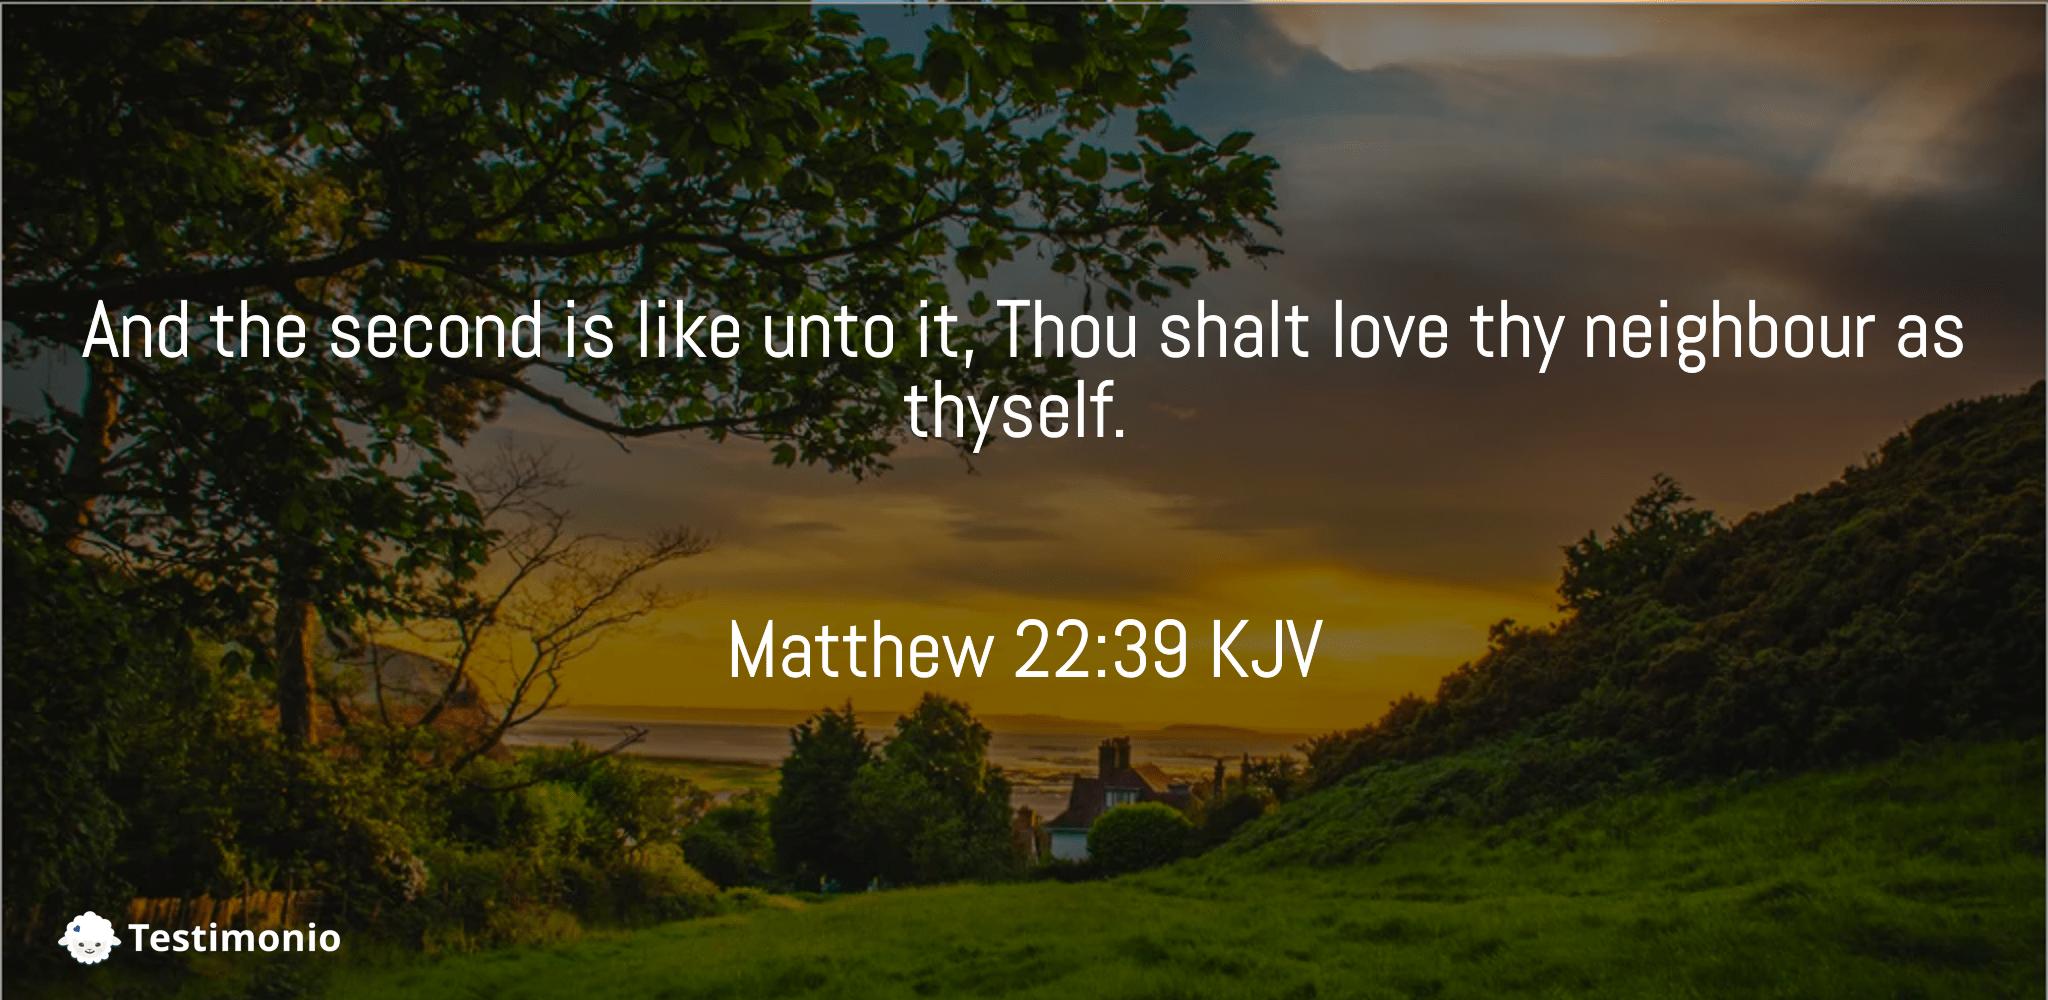 Matthew 22:39